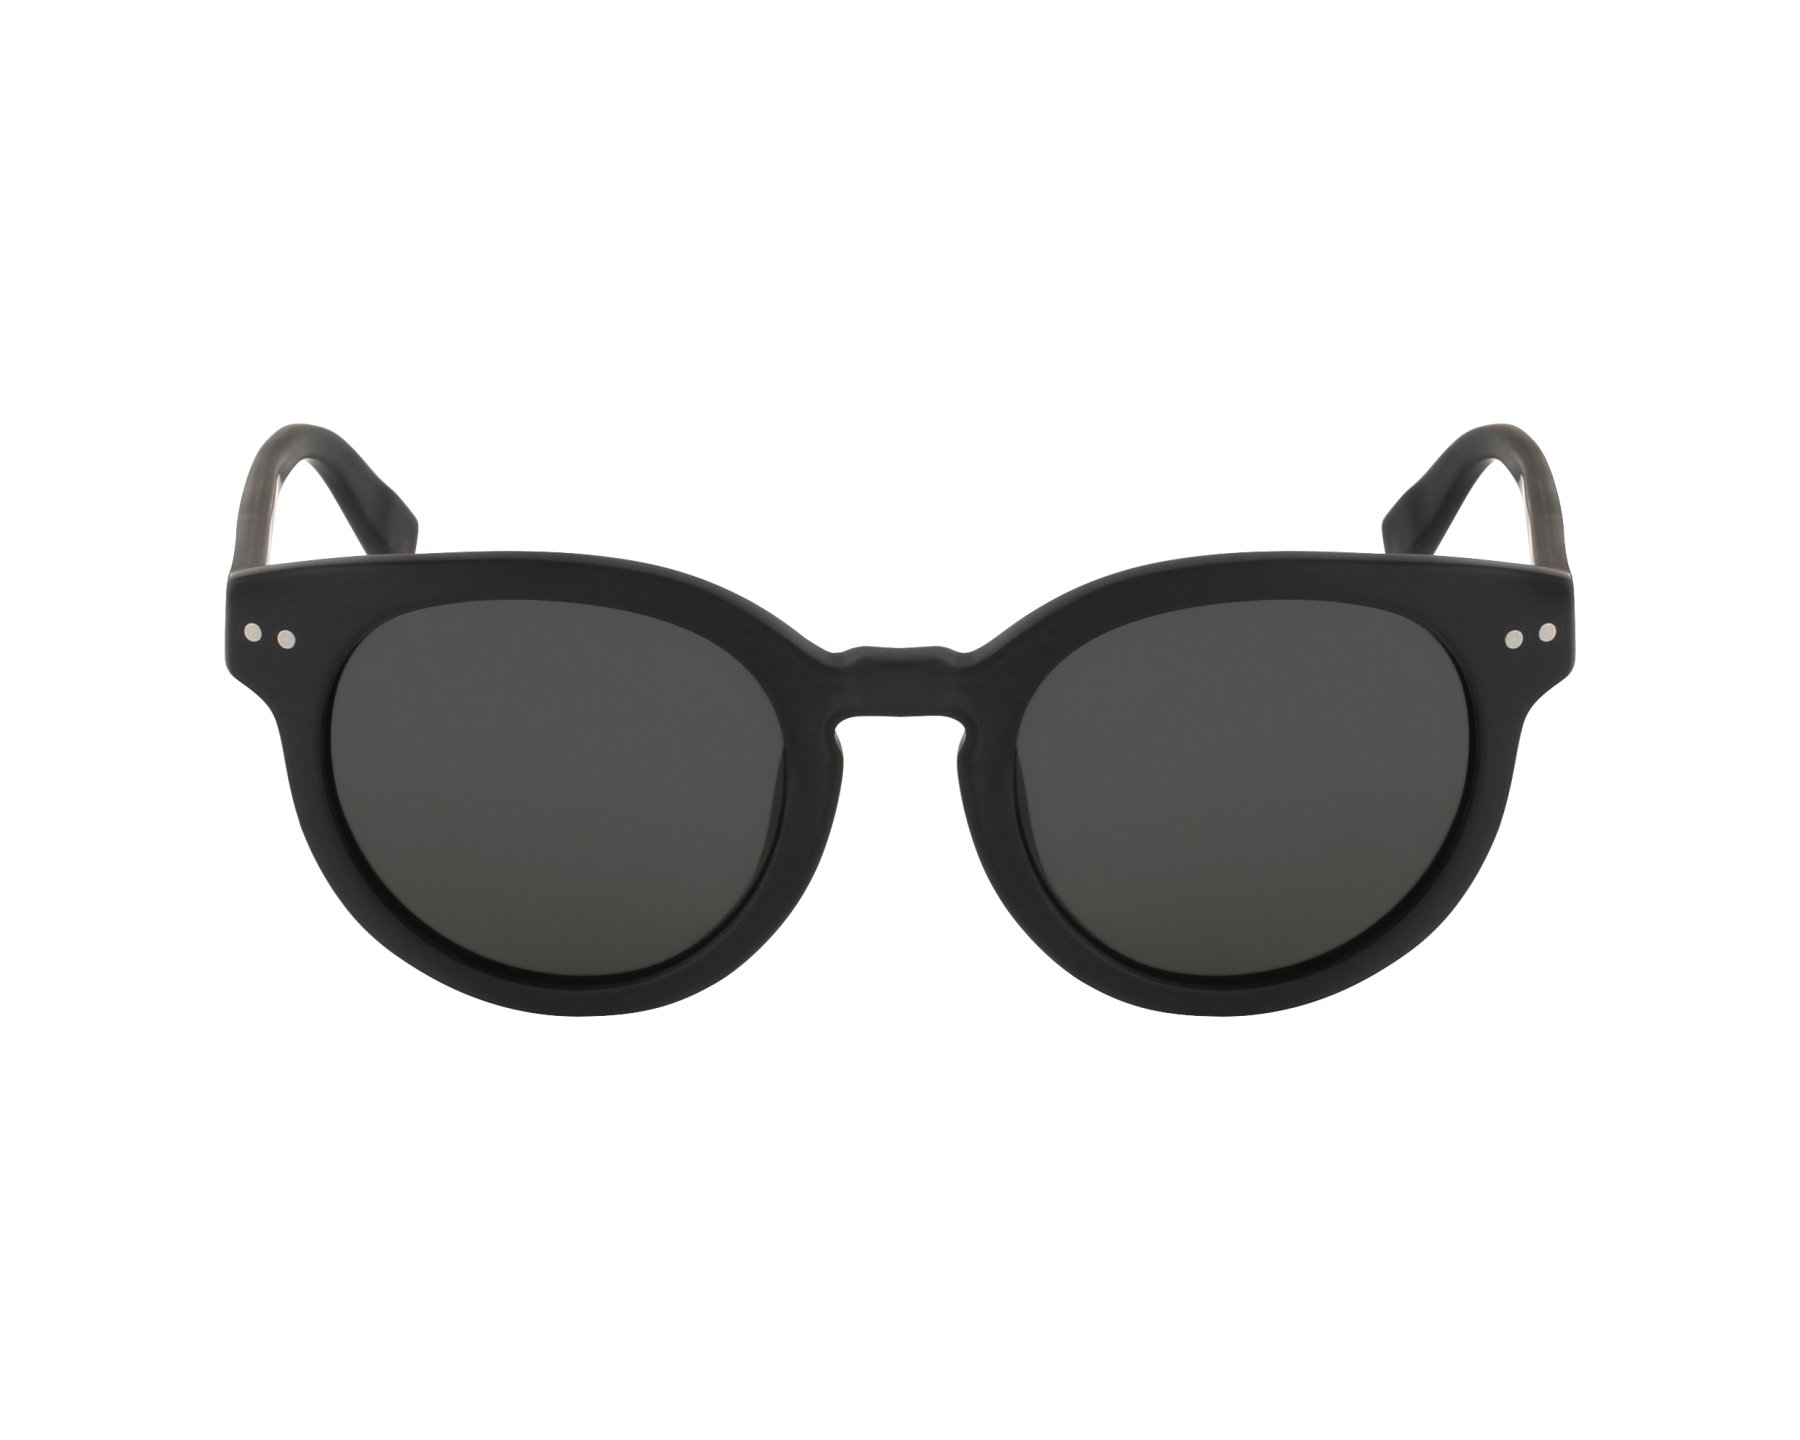 3d7f1389002 Sunglasses Michael Kors MKS-854-M 001 51-23 Black profile view